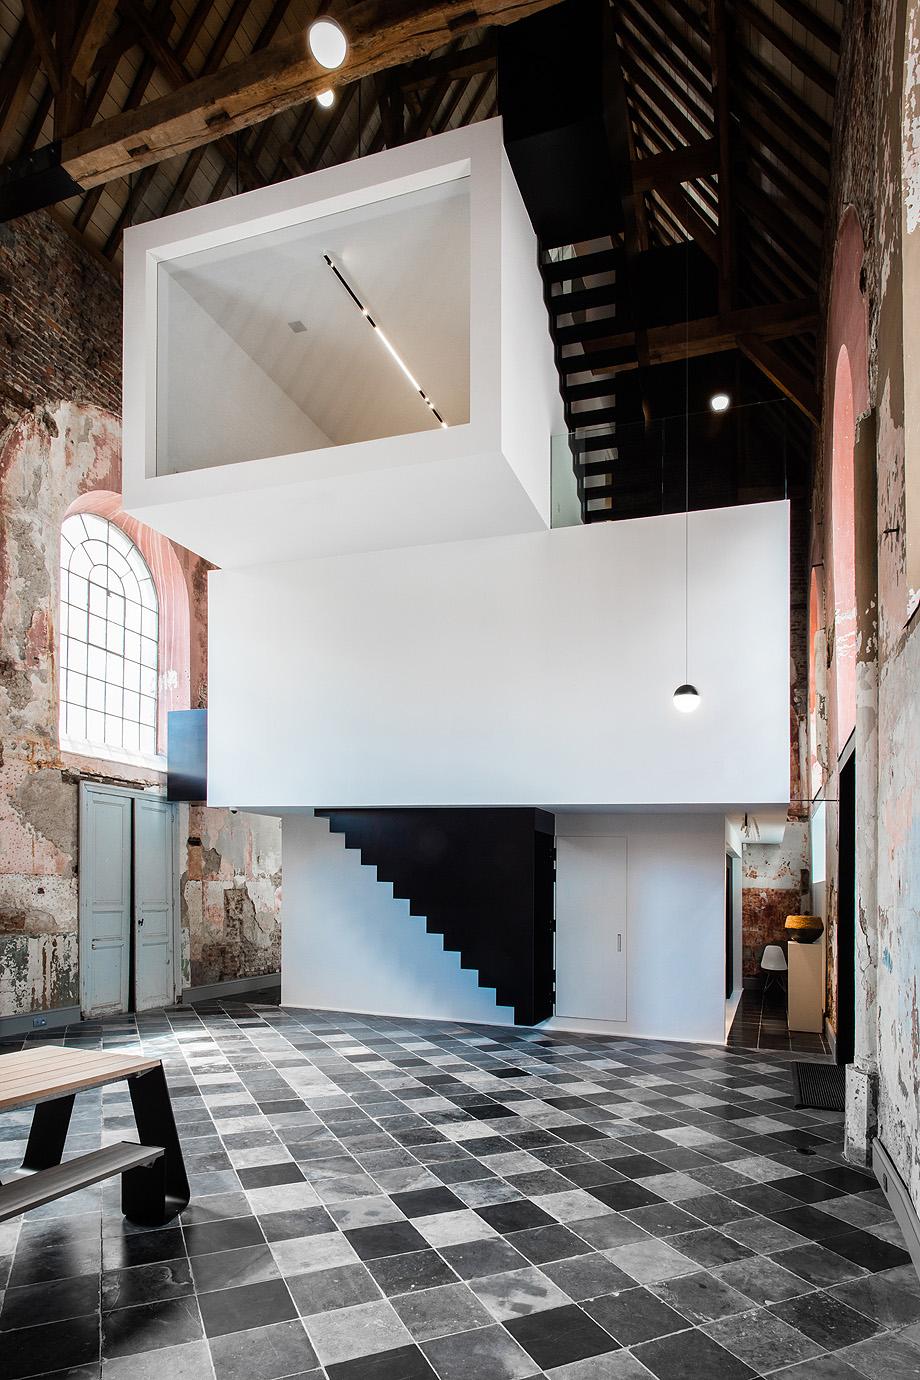 oficina de arquitectura de klaarchitectuur - foto valerie clarysse (2)